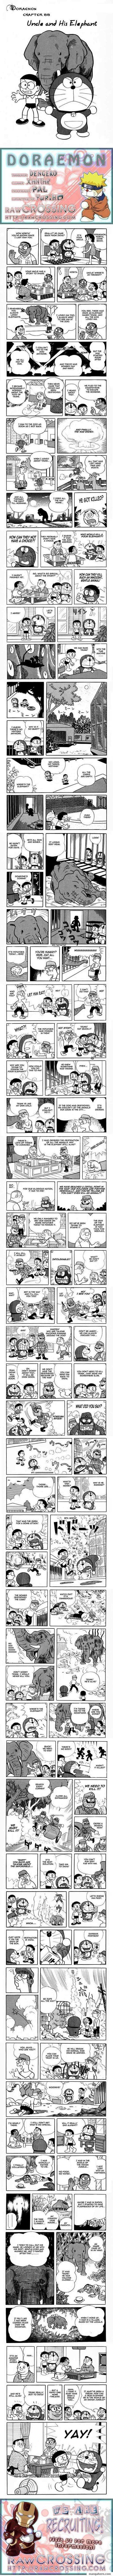 Doraemon 88 Page 1